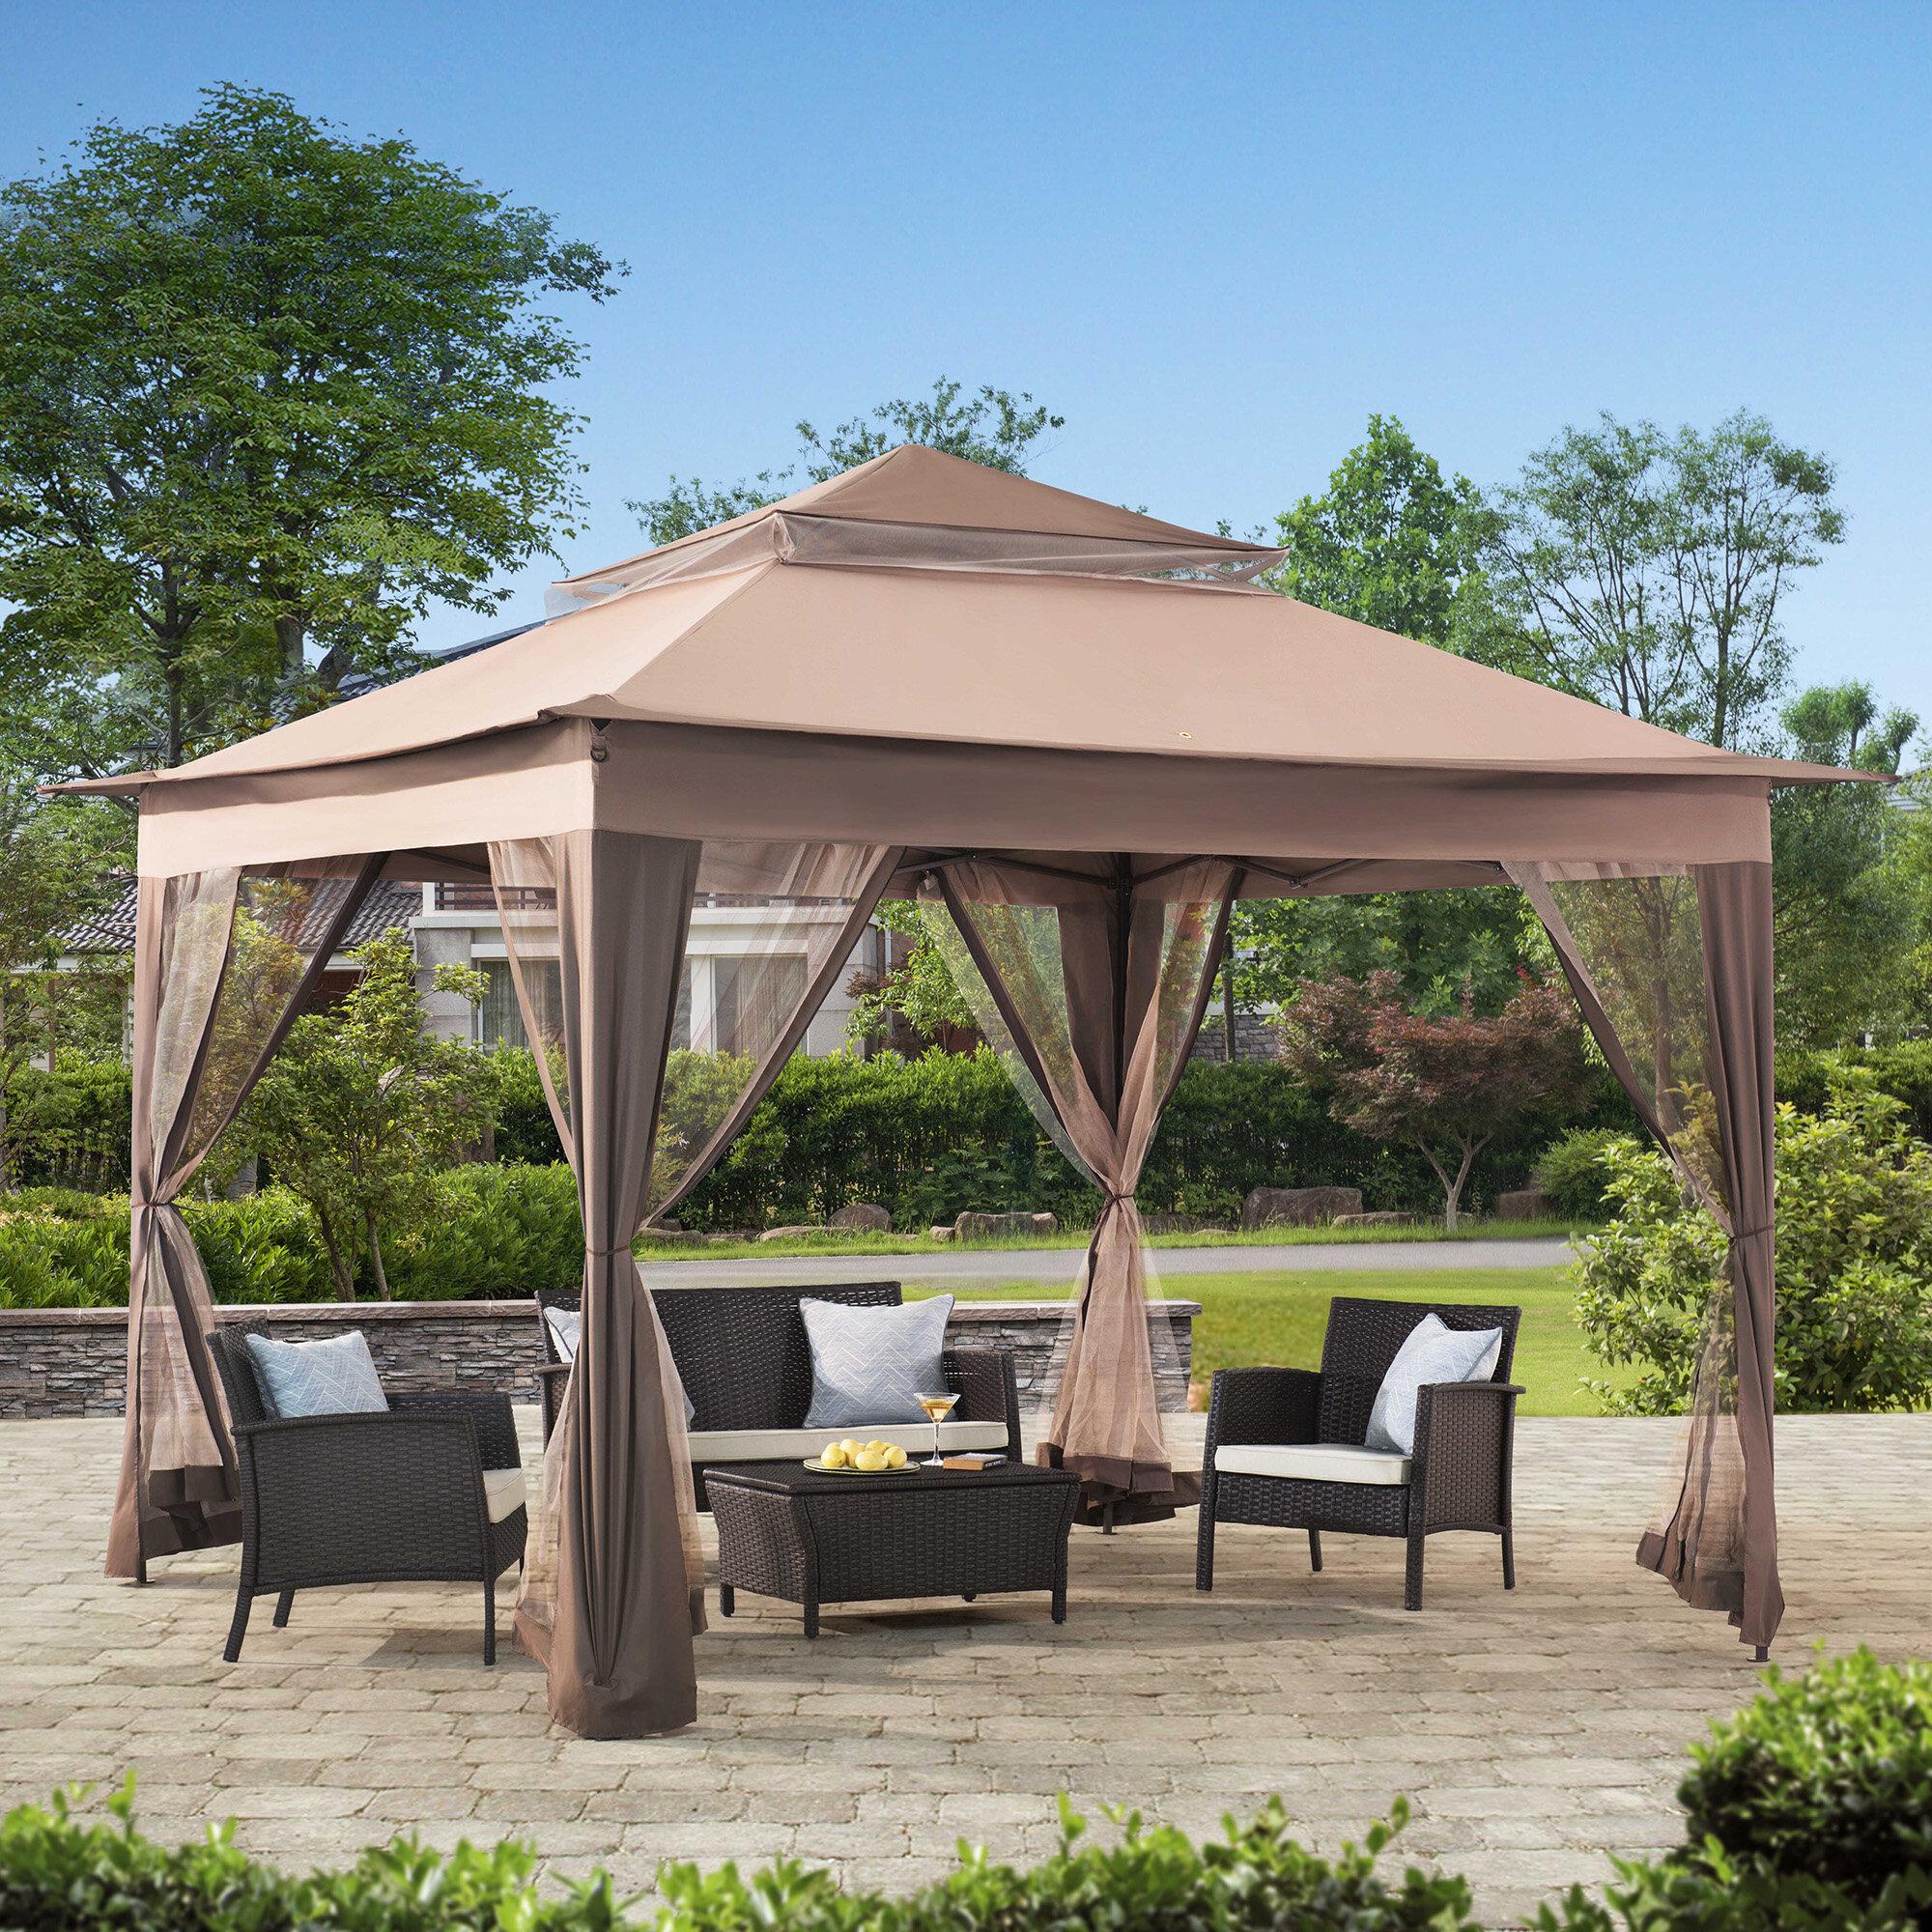 Sunjoy 10 Ft. W x 10 Ft. D Patio Canopy & Reviews   Wayfair.ca on entry canopy lighting, backyard pergola lighting, backyard gazebo lighting, patio canopy lighting,